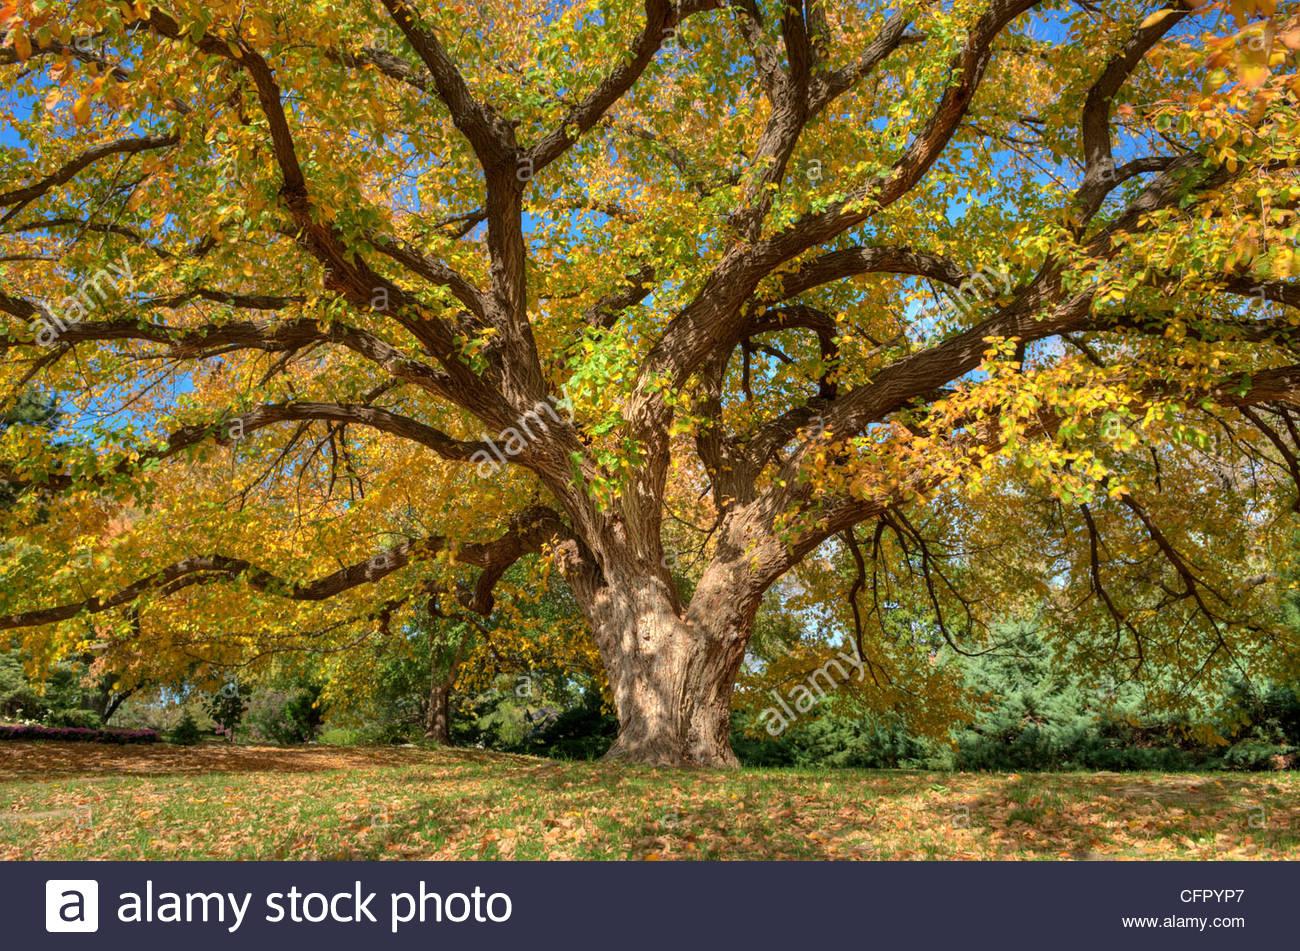 Elm Tree, Botanica, Wichita, Kansas, Sunday Oct 30, 2011 - Stock Image